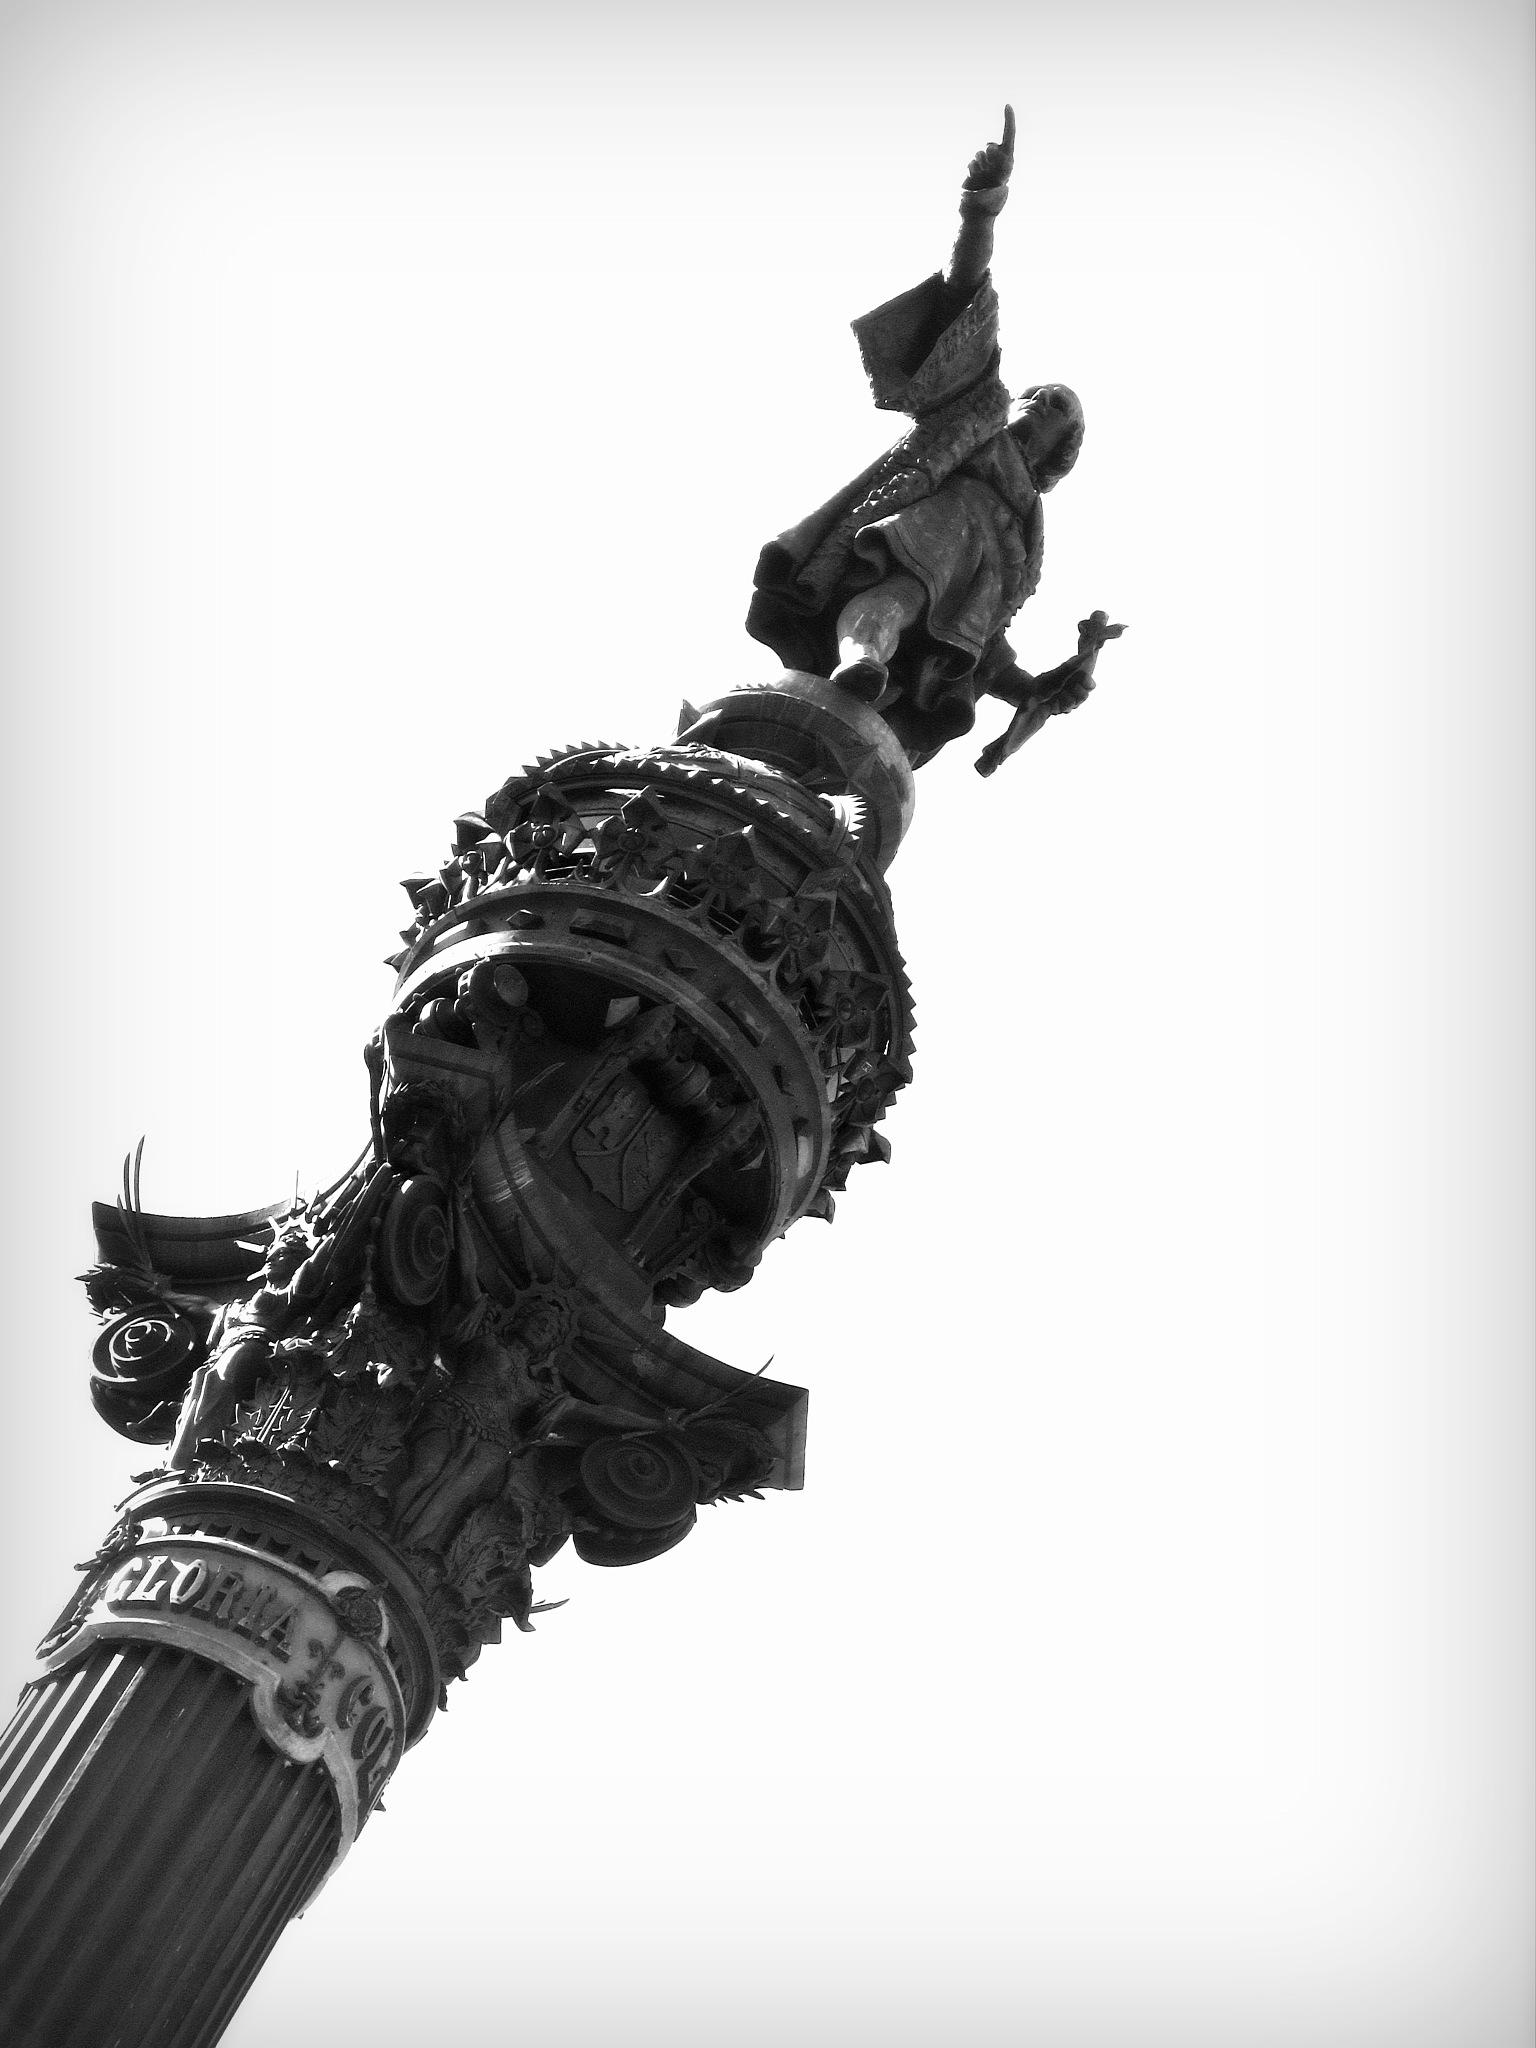 colon barcelona by angelgarcia